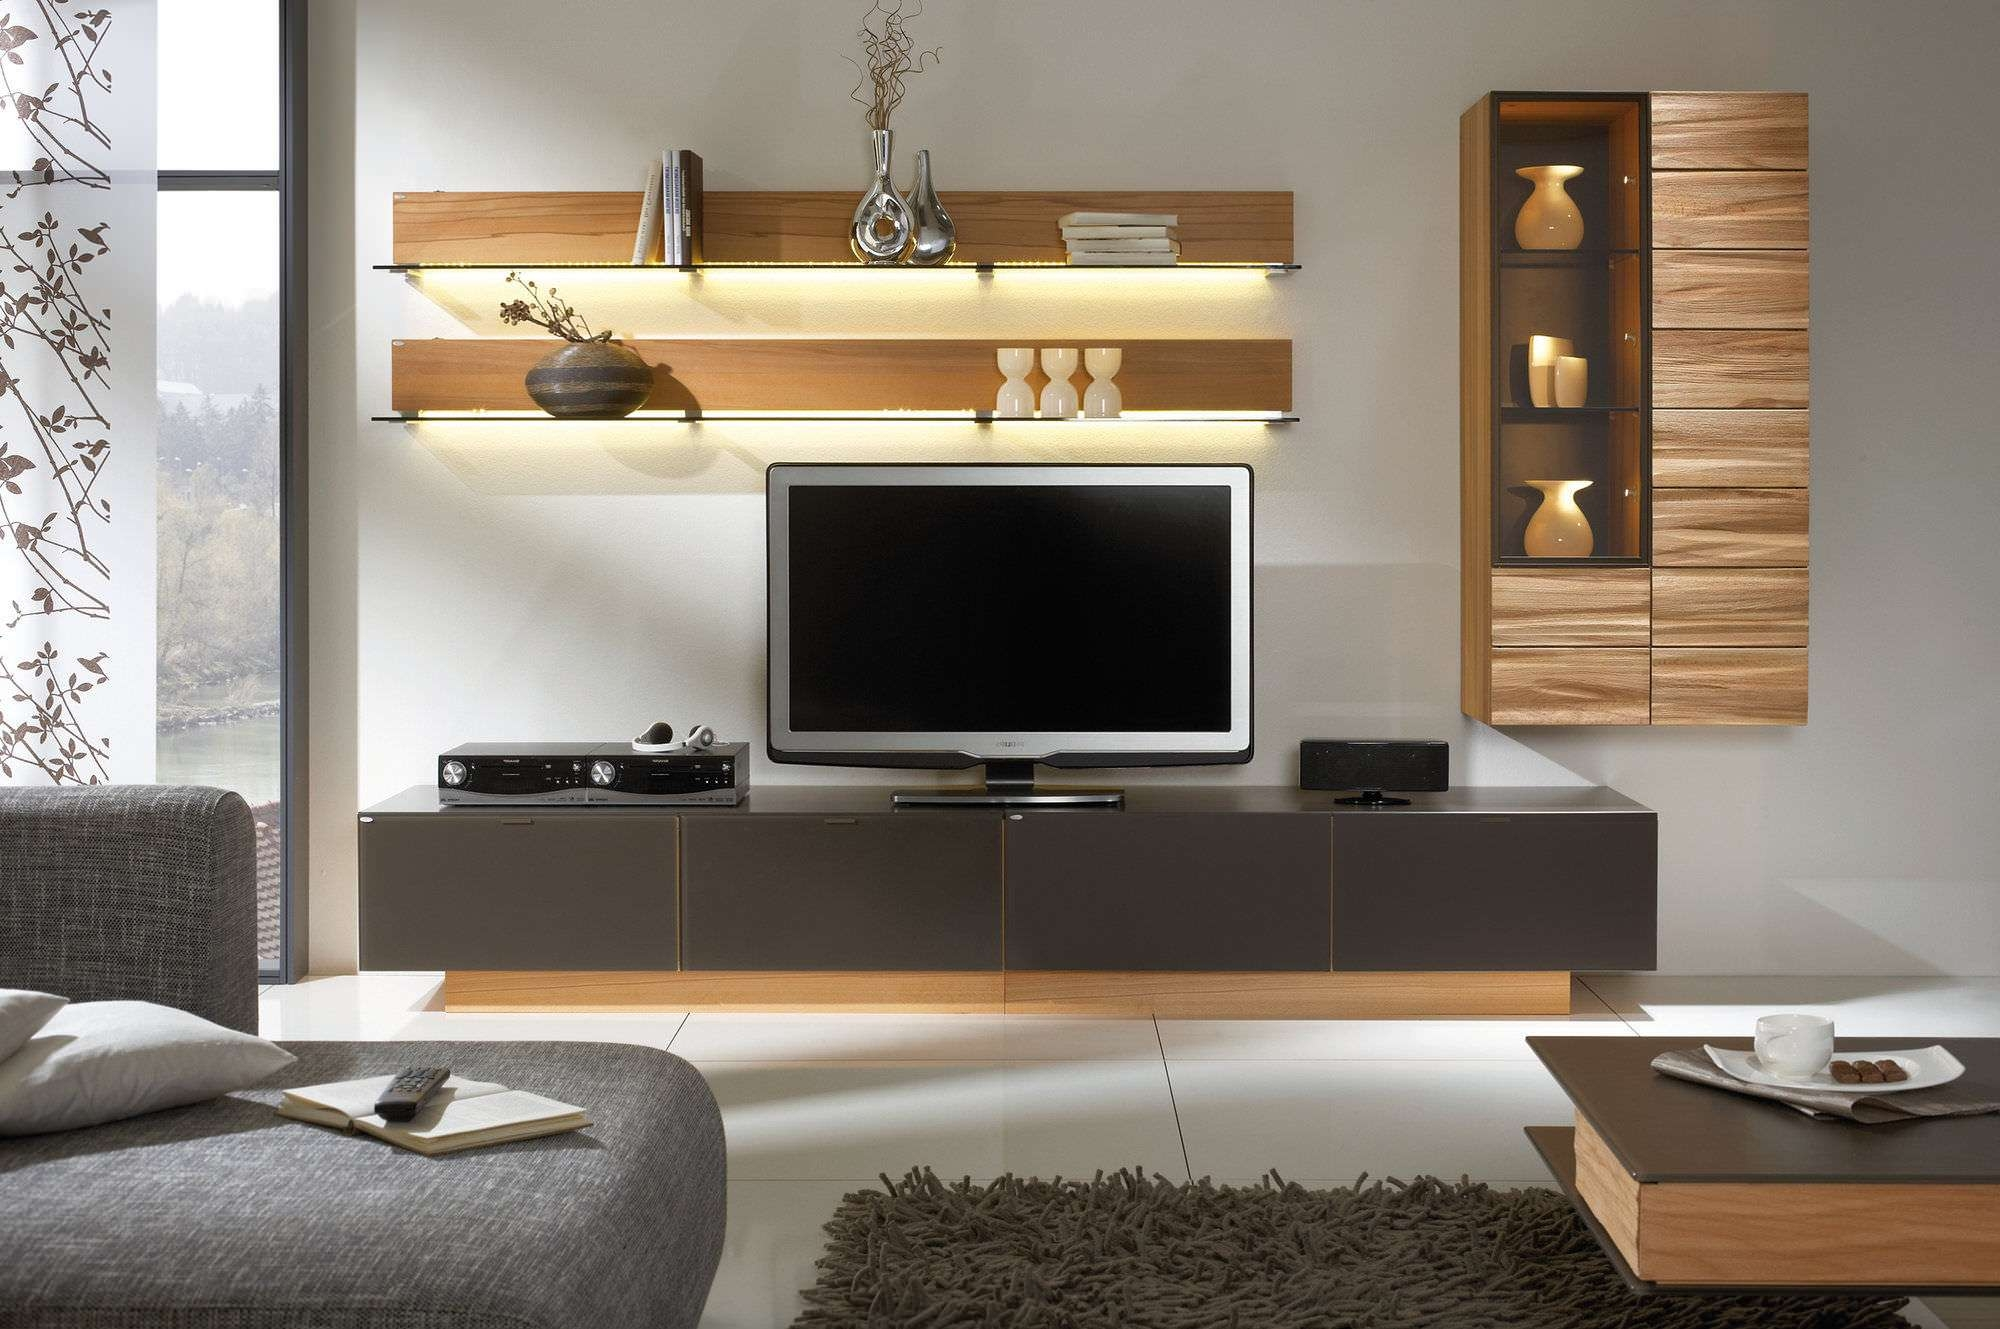 Bedroom : Modern Tv Units Tv Unit Design Contemporary Tv Units In Contemporary Tv Cabinets (View 9 of 20)